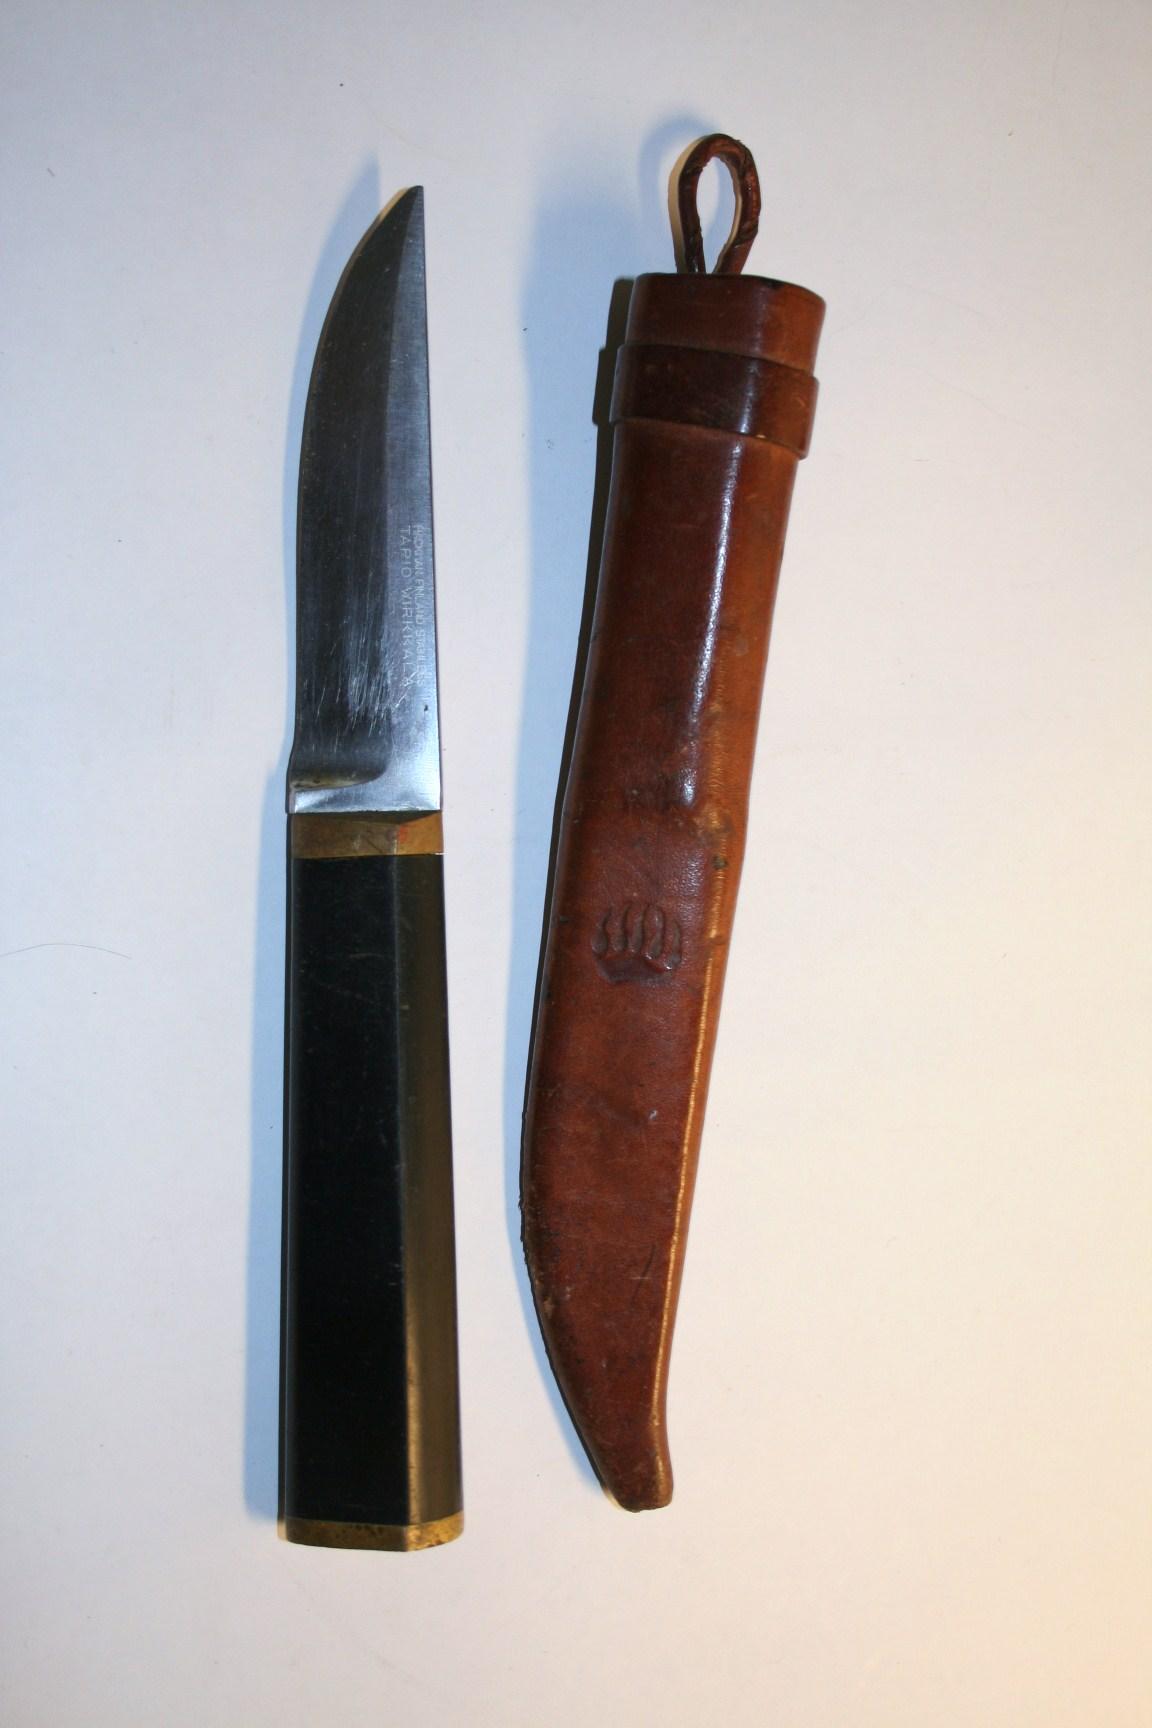 Tapio Wirkkala knife